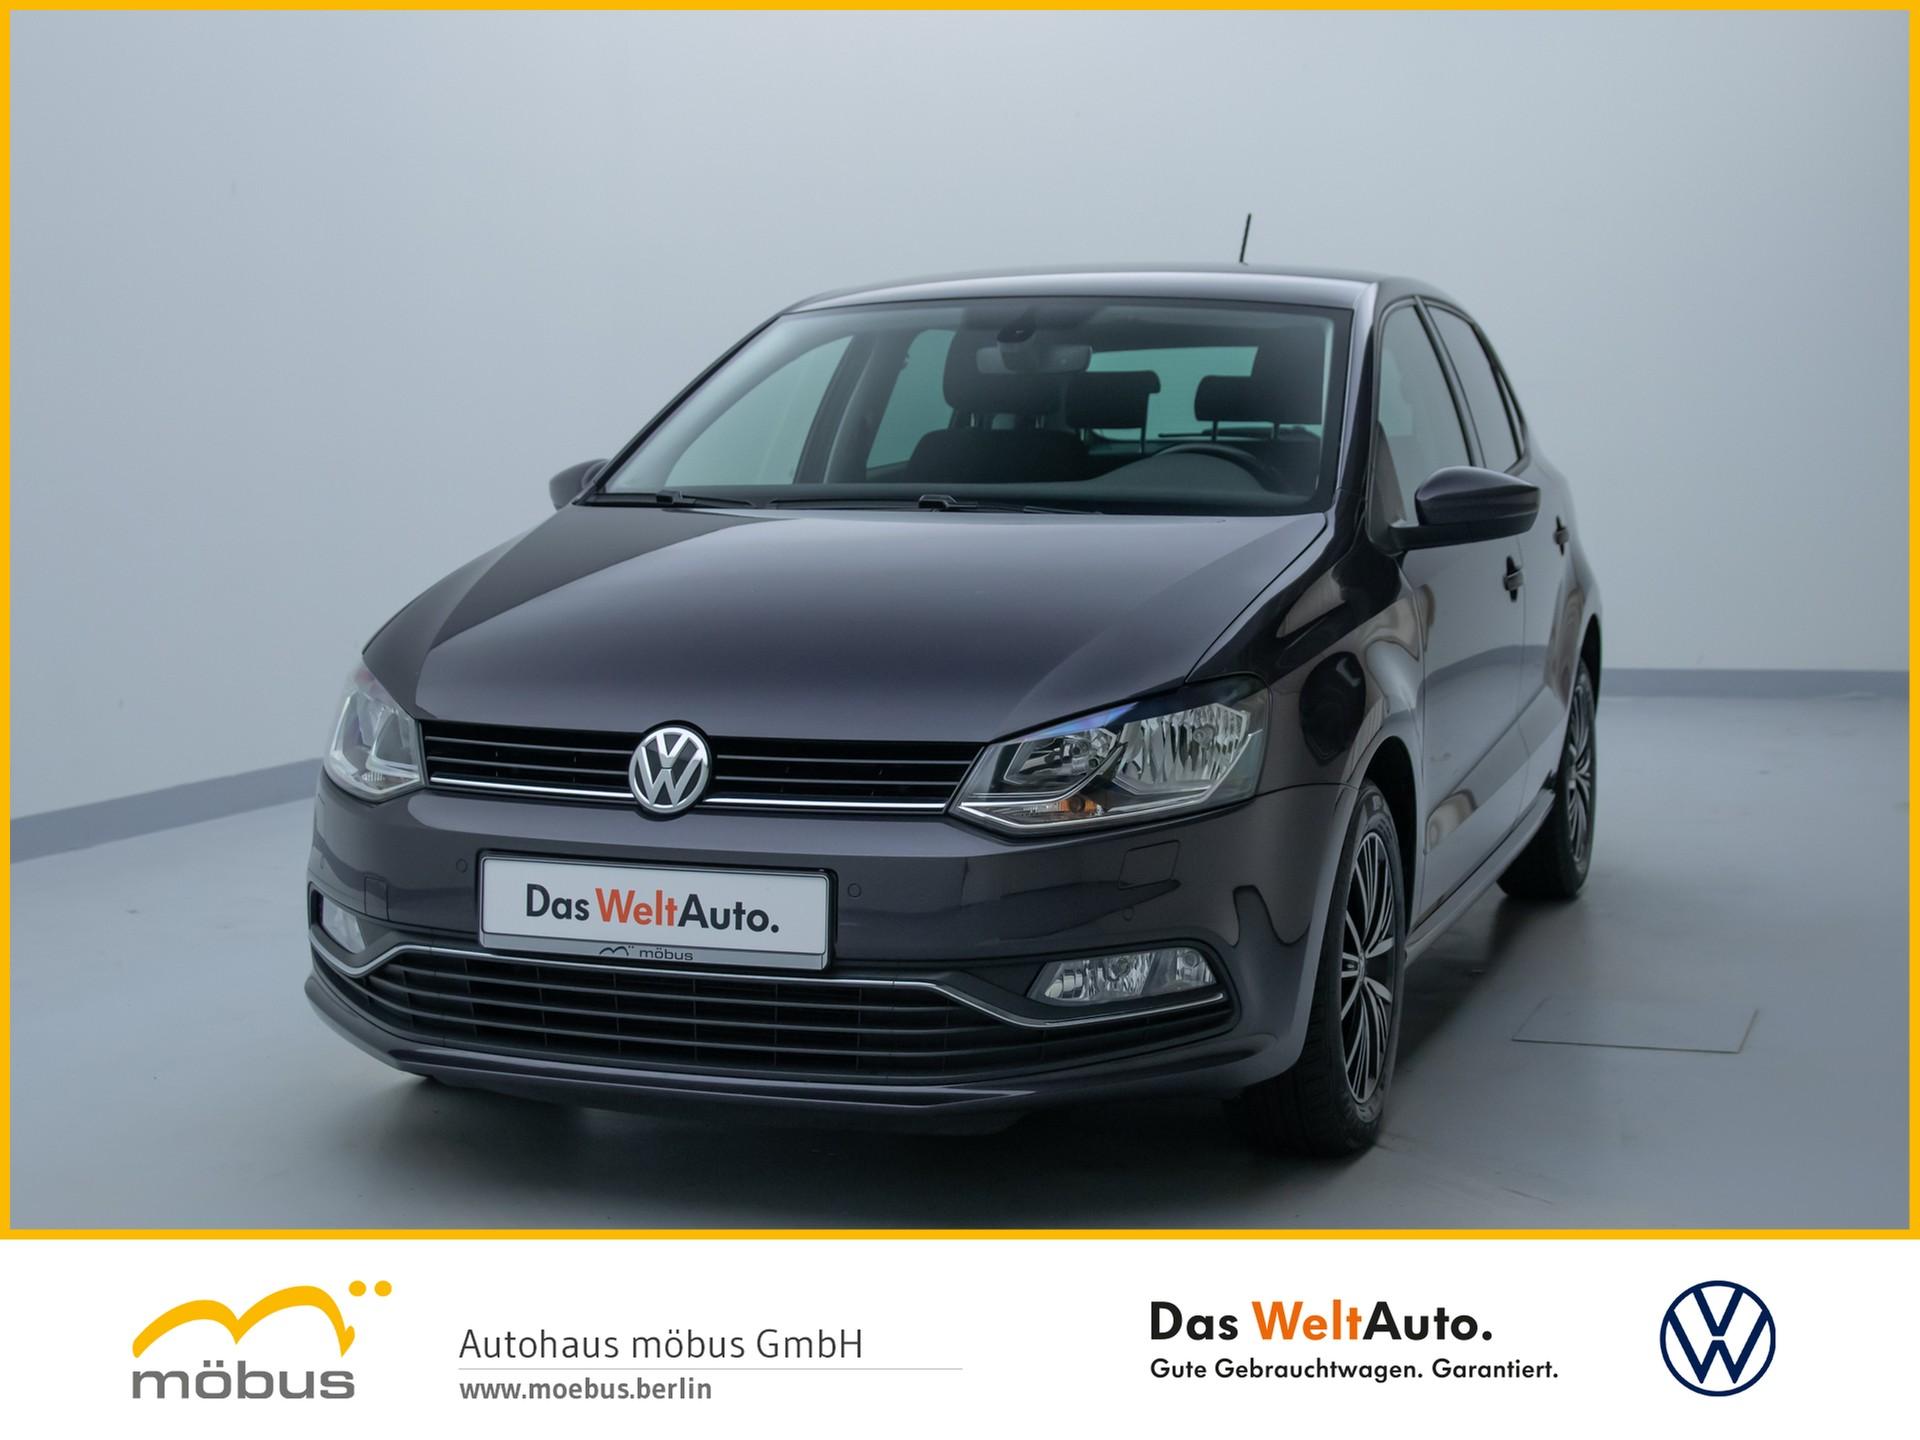 Volkswagen Polo 1.2 TSI DSG ALLSTAR +KLIMA+SHZG+LM-FELGEN+, Jahr 2016, Benzin